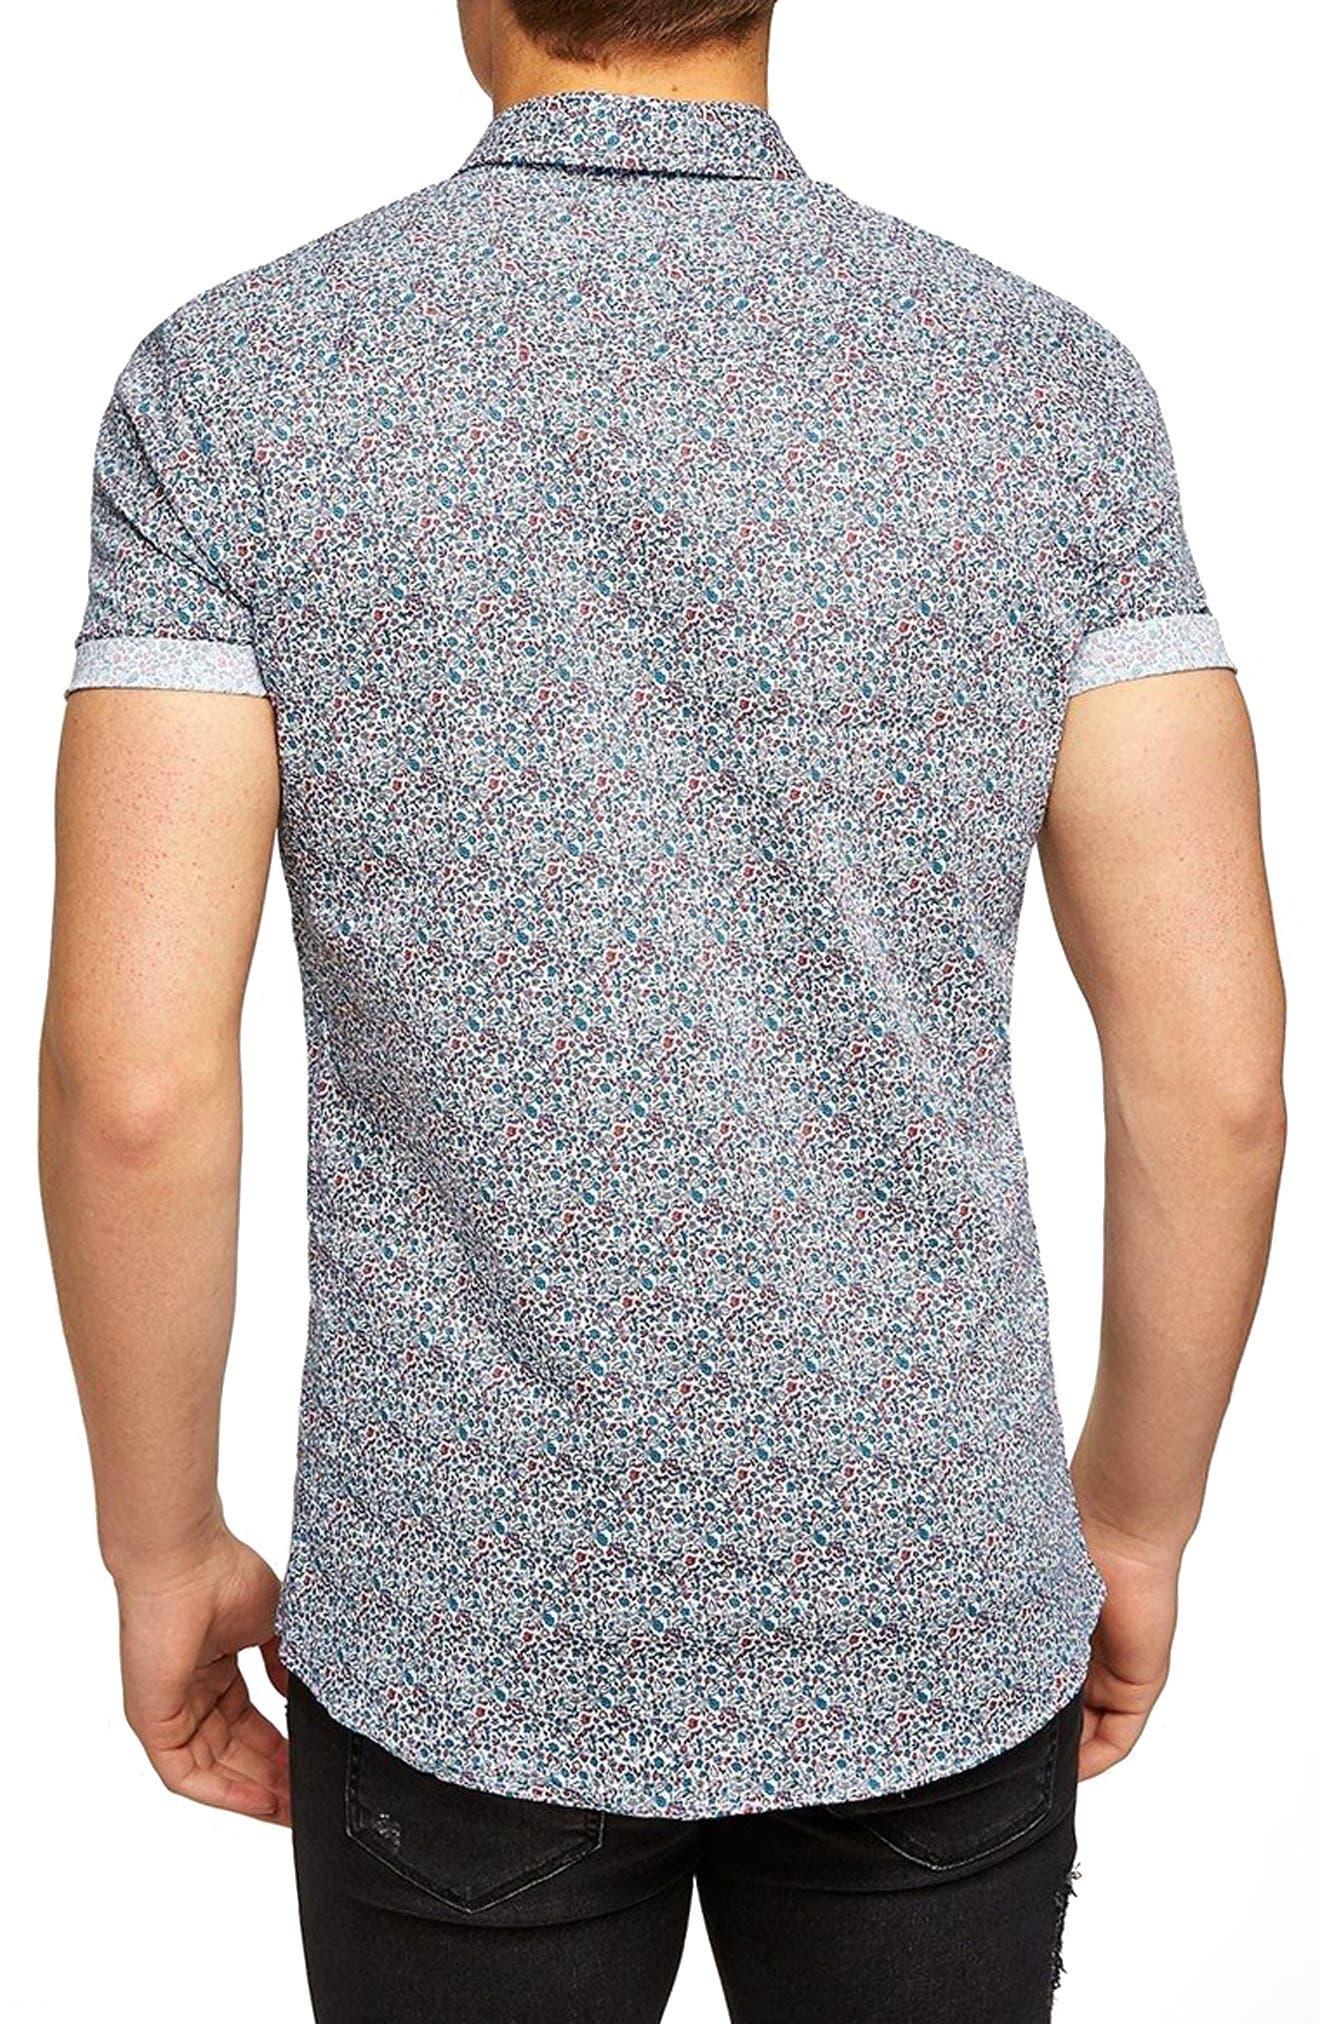 Muscle Fit Ditzy Floral Print Shirt,                             Alternate thumbnail 2, color,                             100